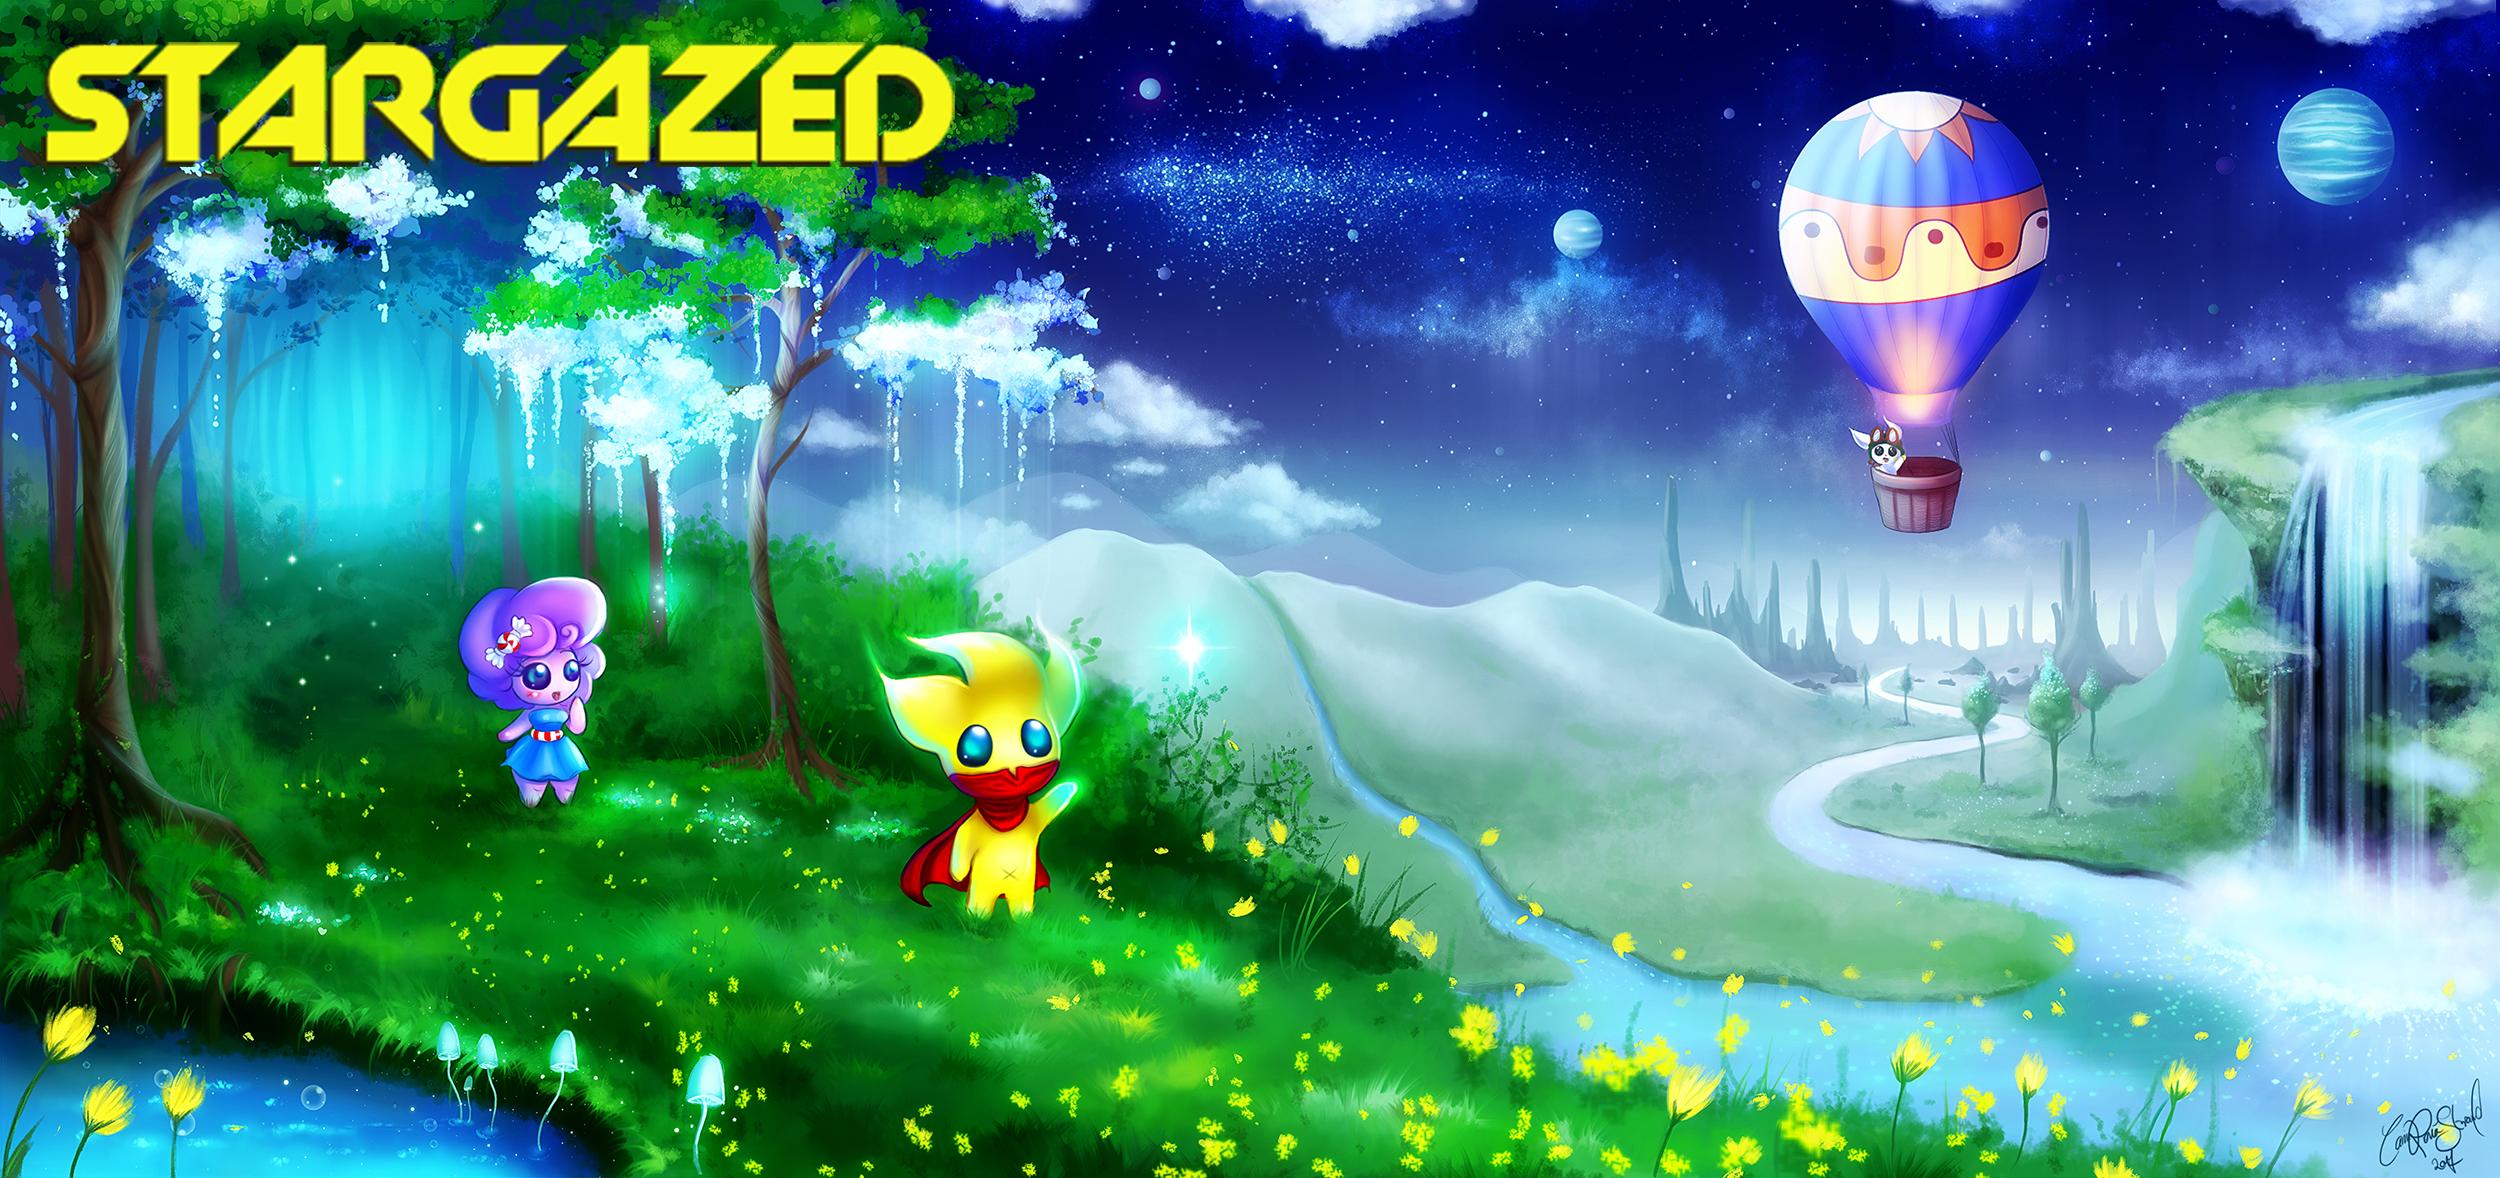 Stargazed: Lightyears from home